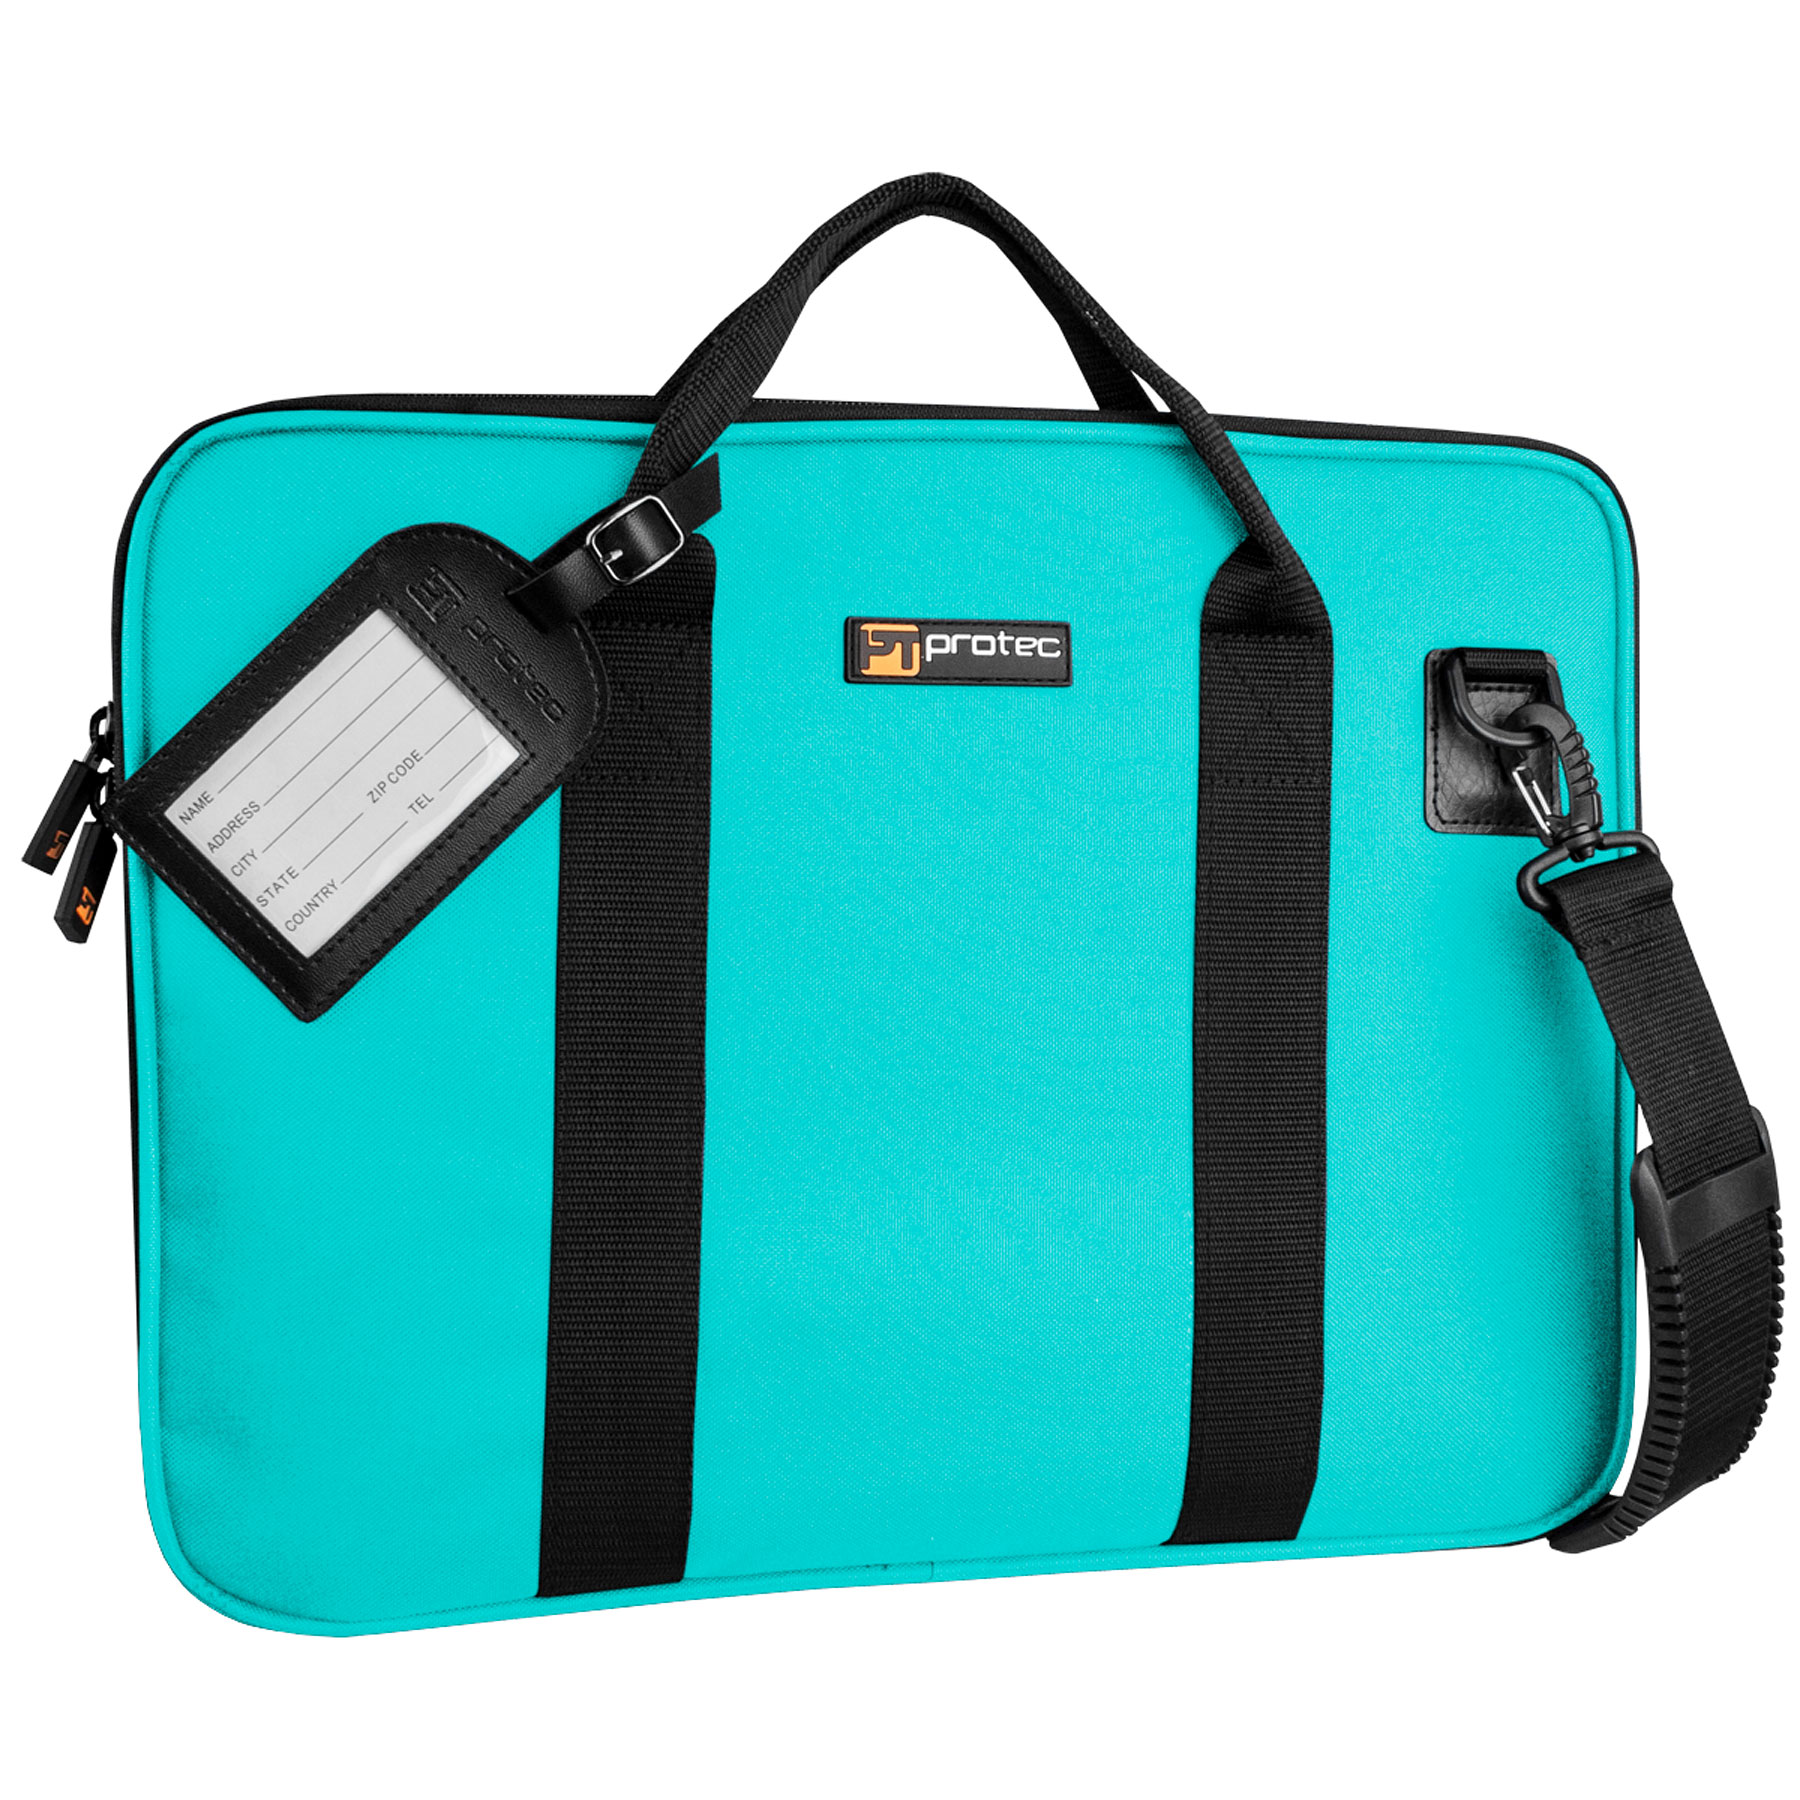 Protec Slim Portfolio Bag, Mint